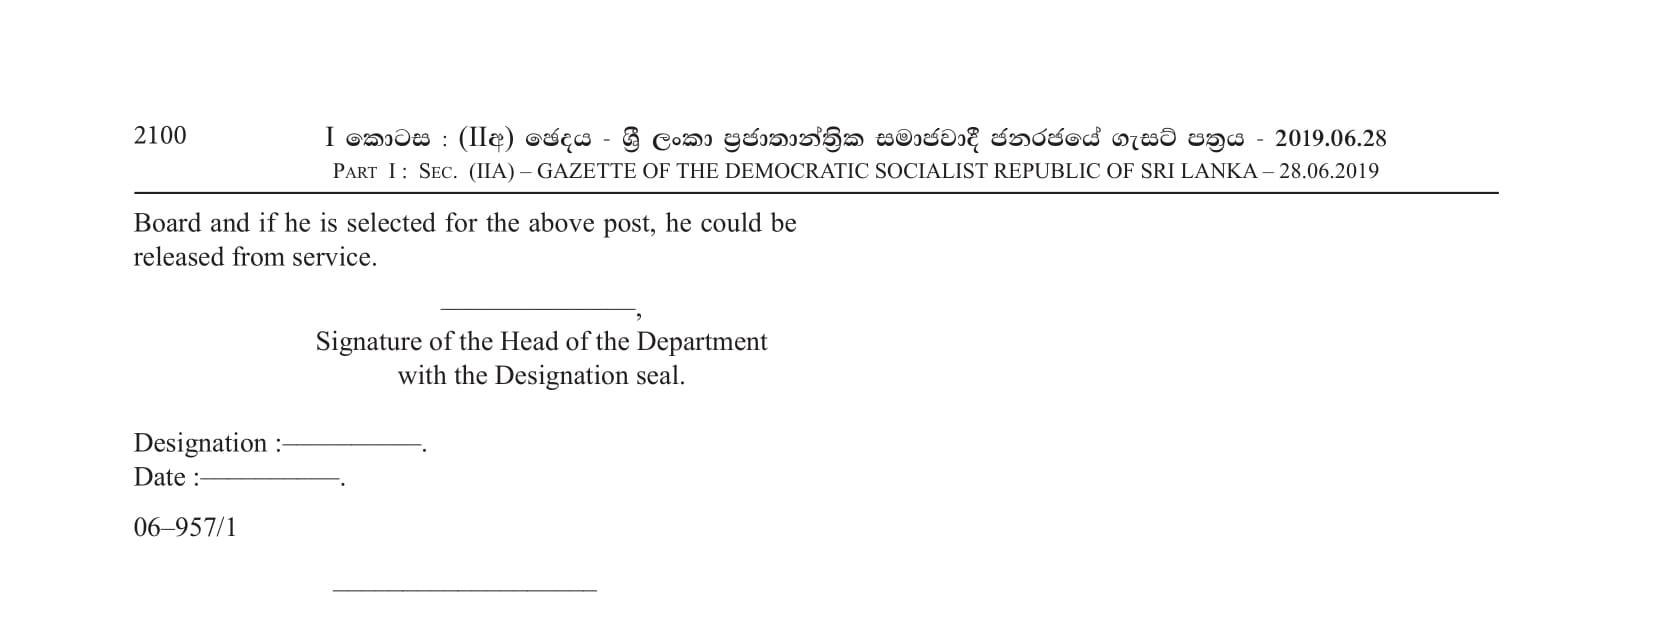 Sub Inspector of Police (State Intelligence Service) - Sri Lanka Police